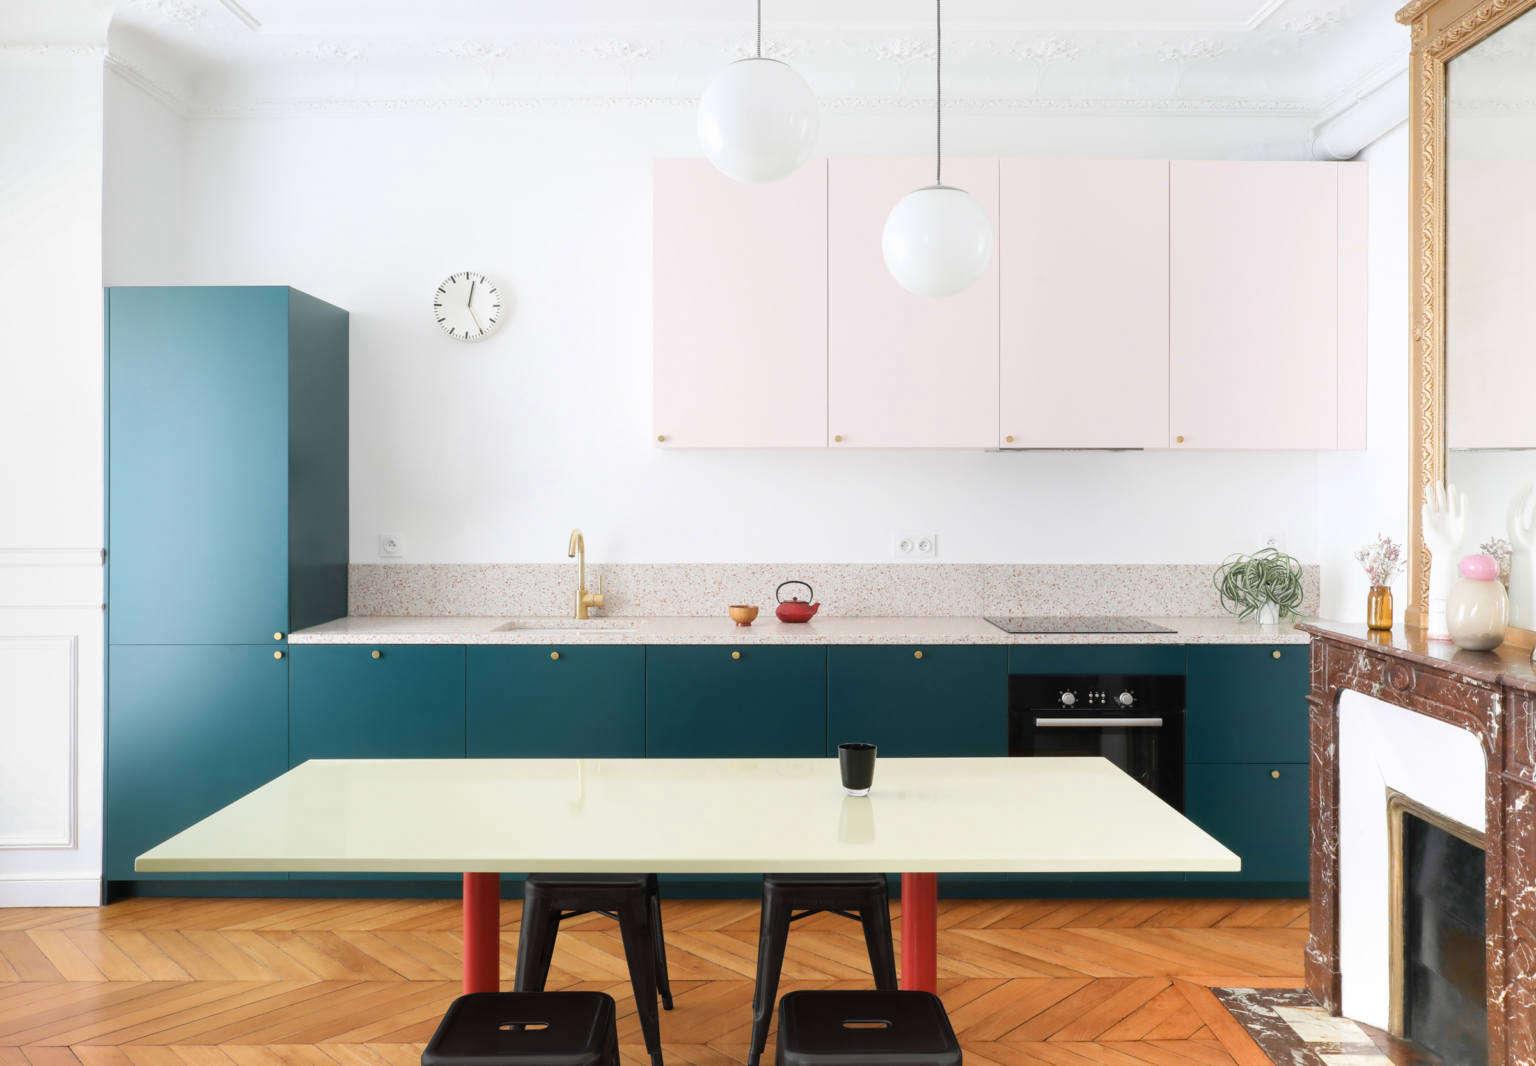 heju studio architecture renovation paris apartment 3 1536x1066